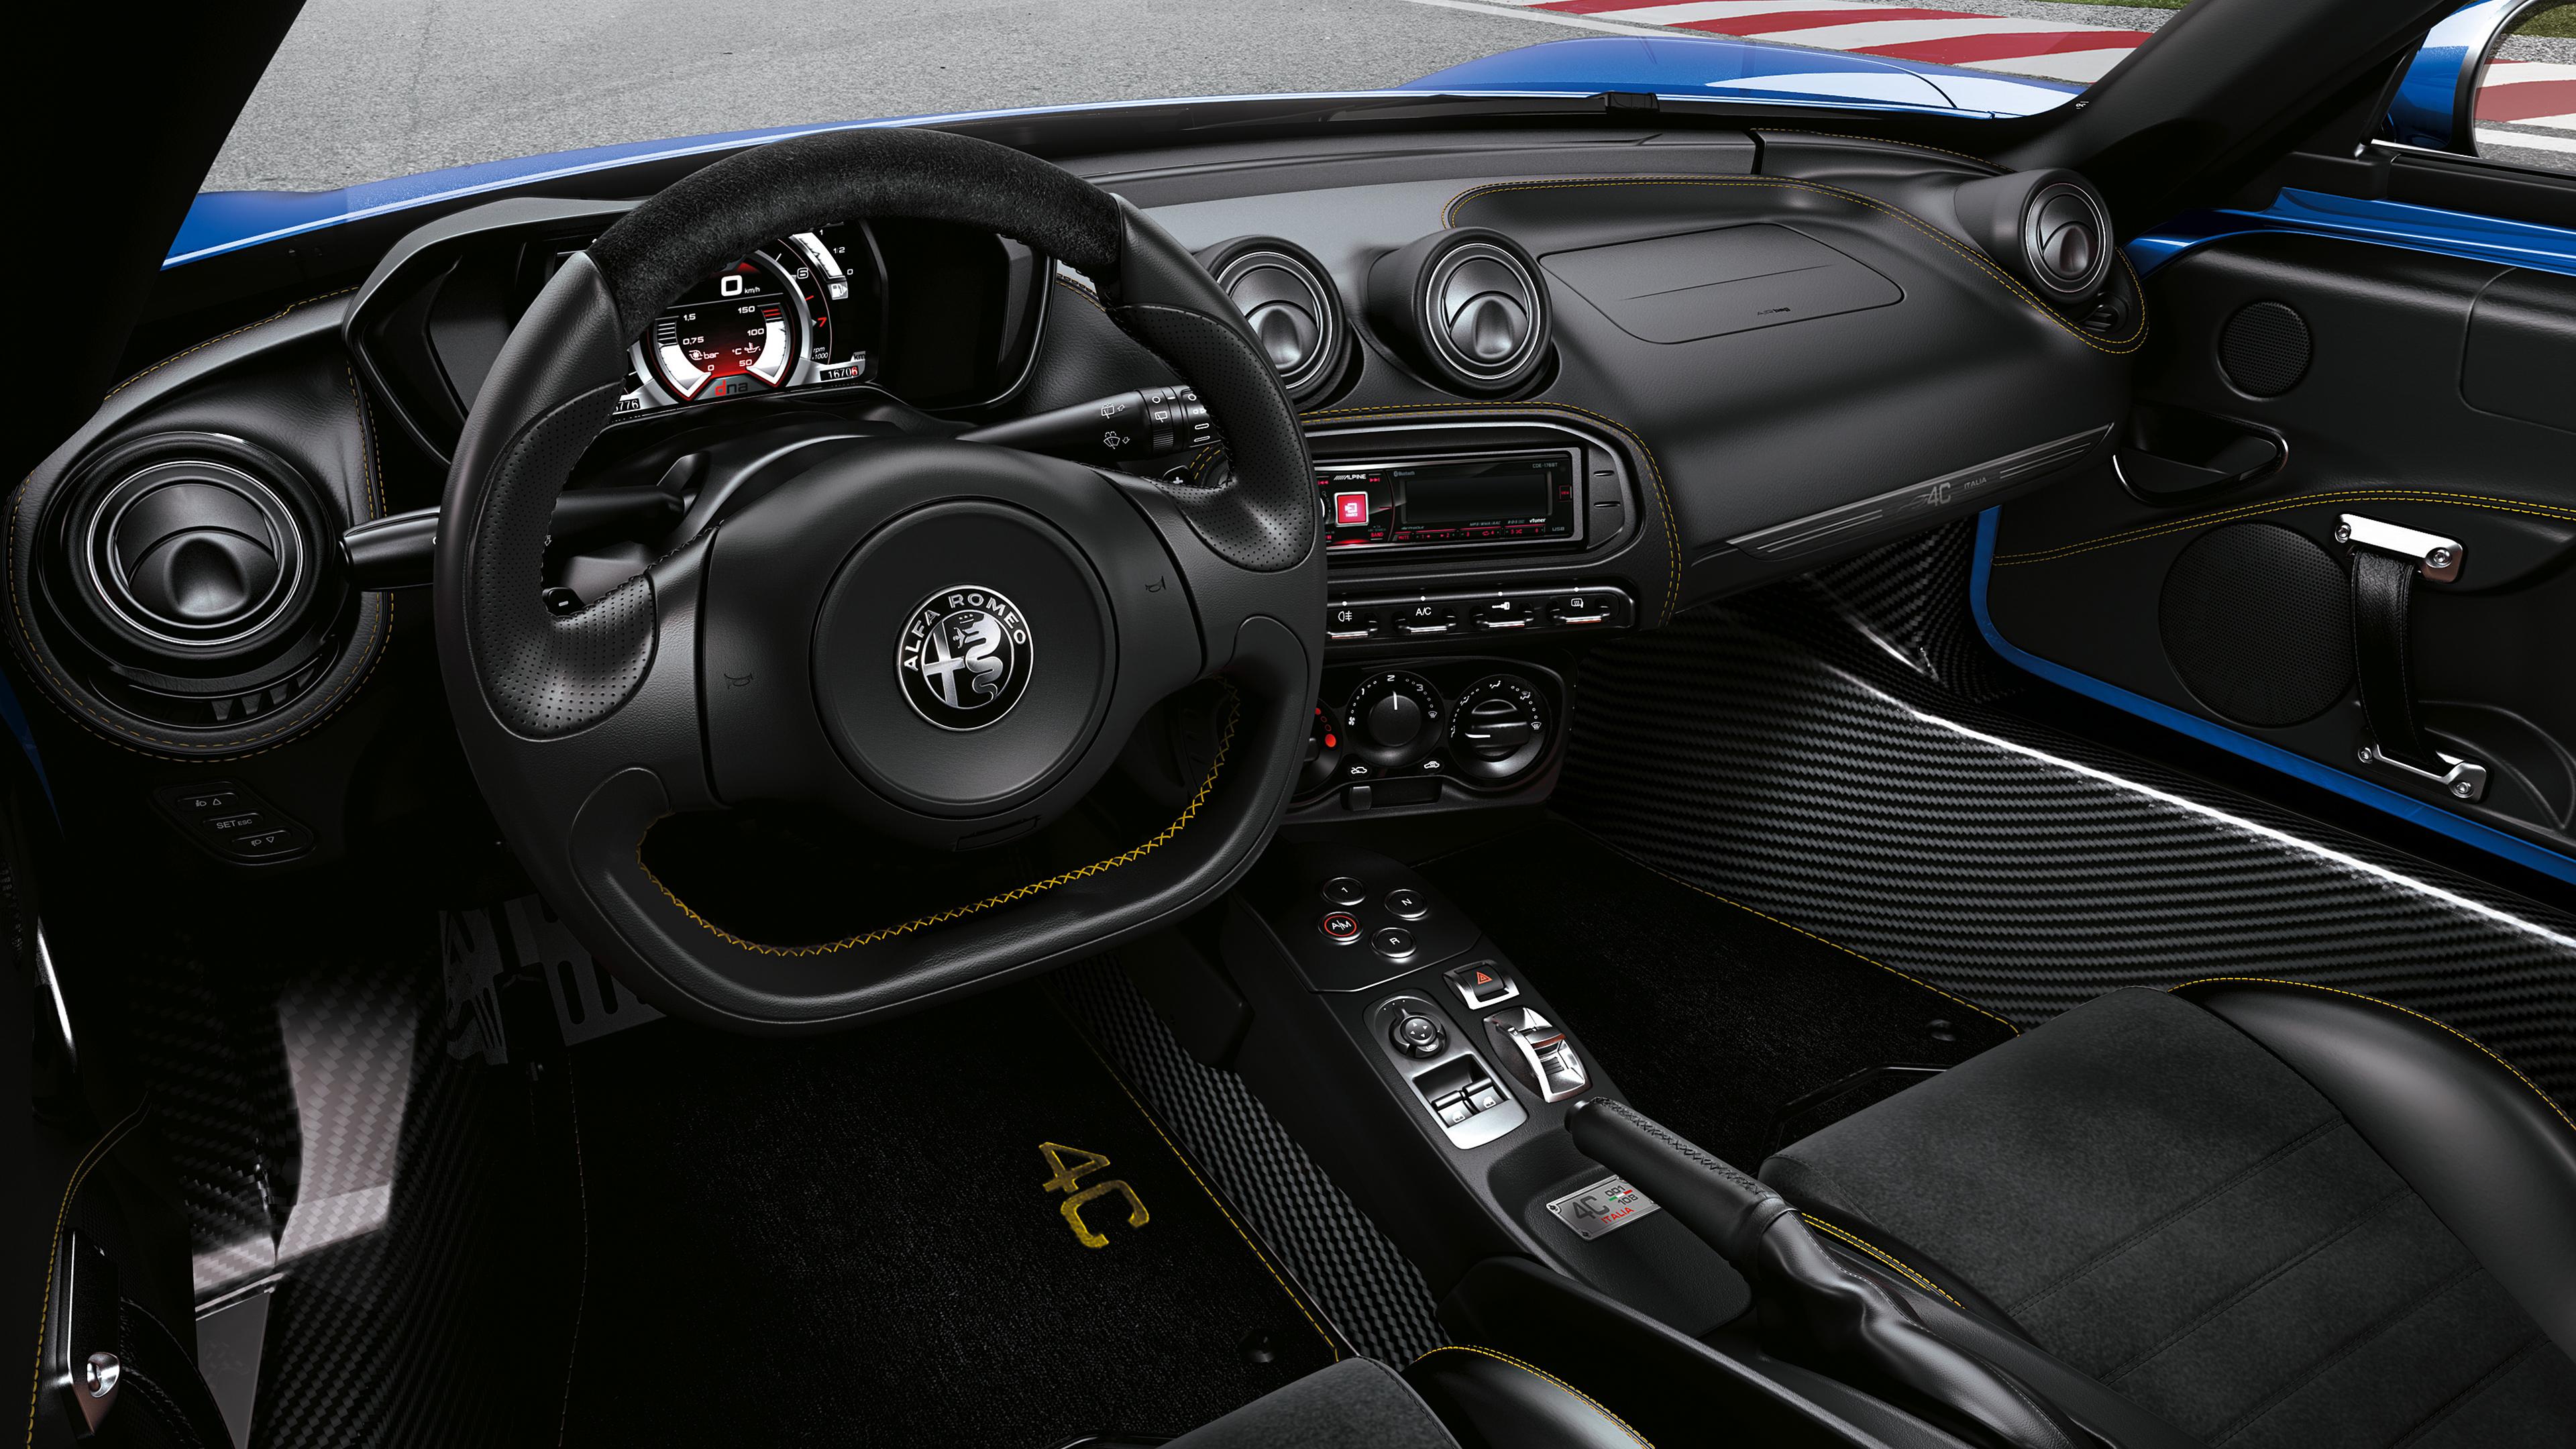 2018 Alfa Romeo 4c Spider Italia 4k 3 Wallpaper Hd Car